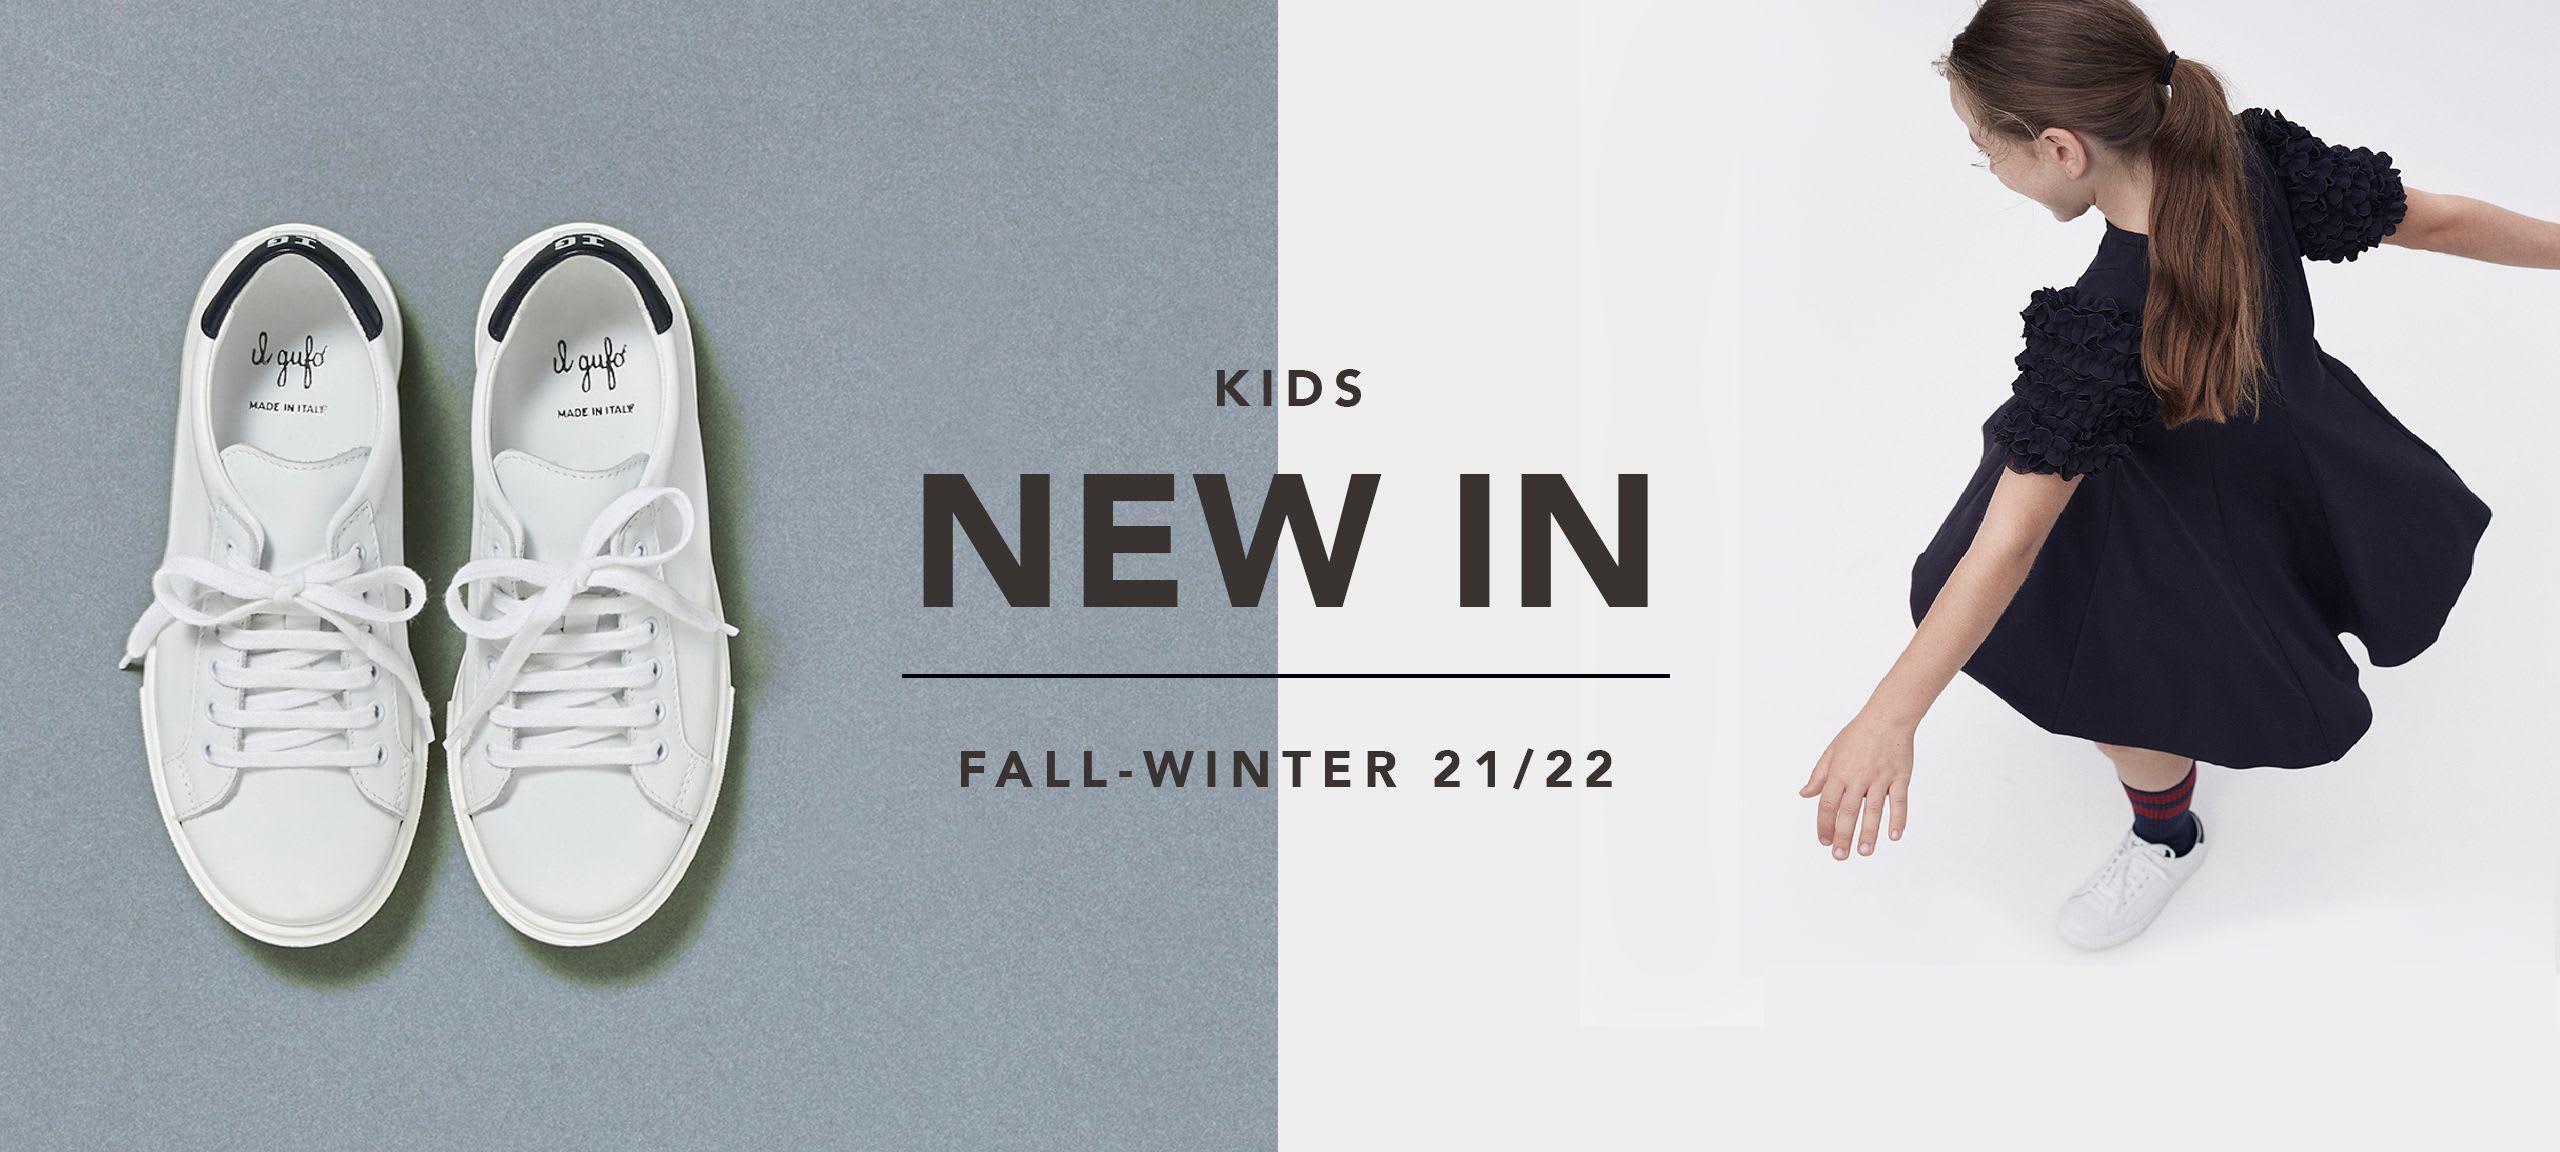 Kids Fall Winter 21/22 by italist